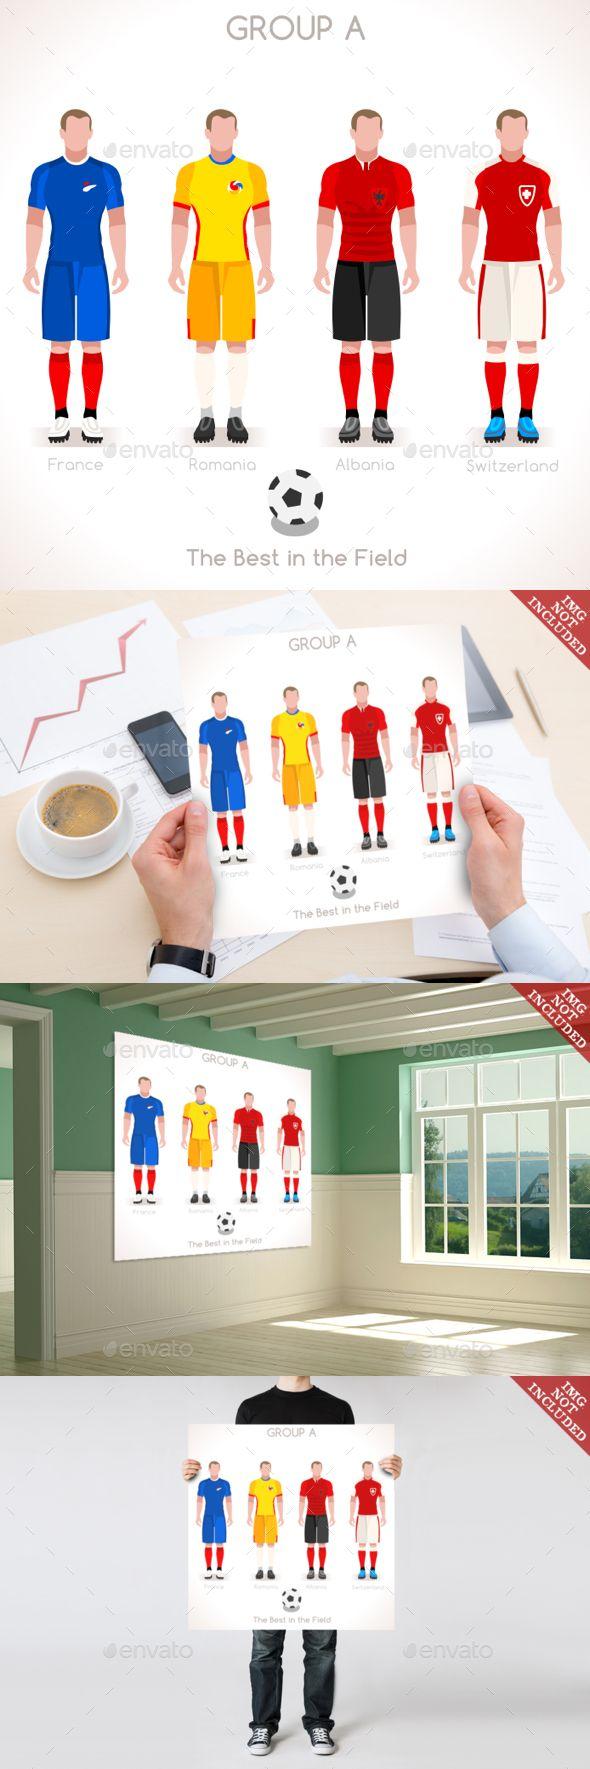 EURO 2016 GROUP A Championship